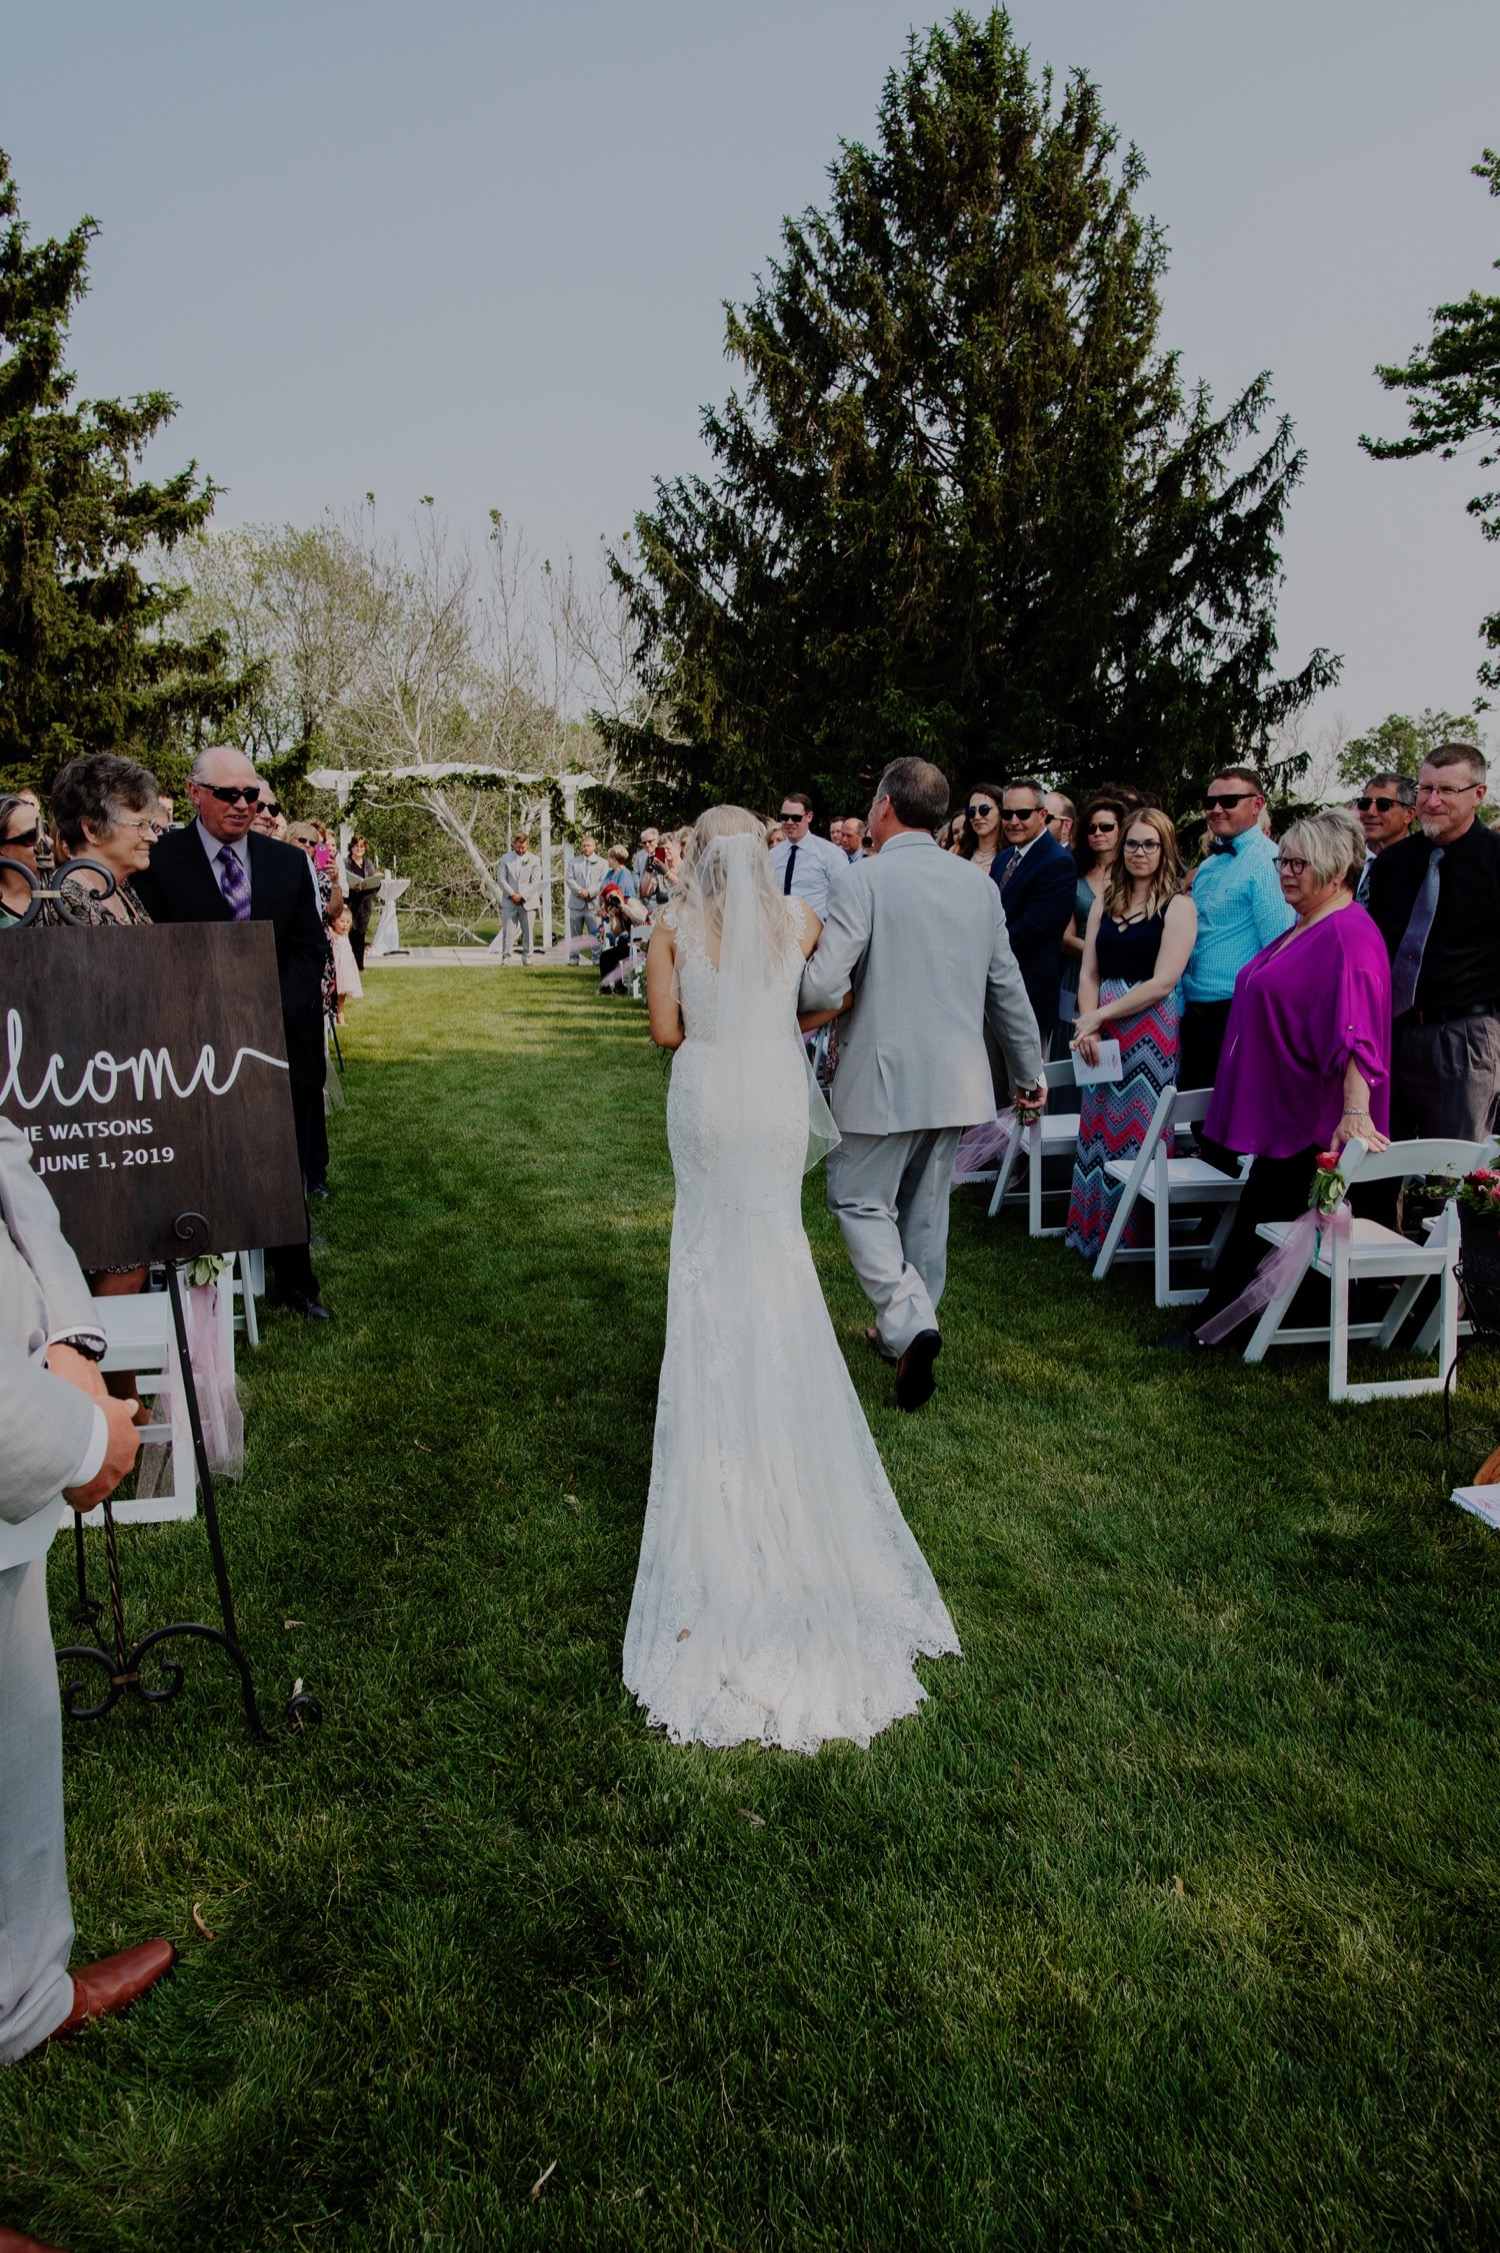 049_Watson-Wedding-Morris-Country-Club_0073.jpg